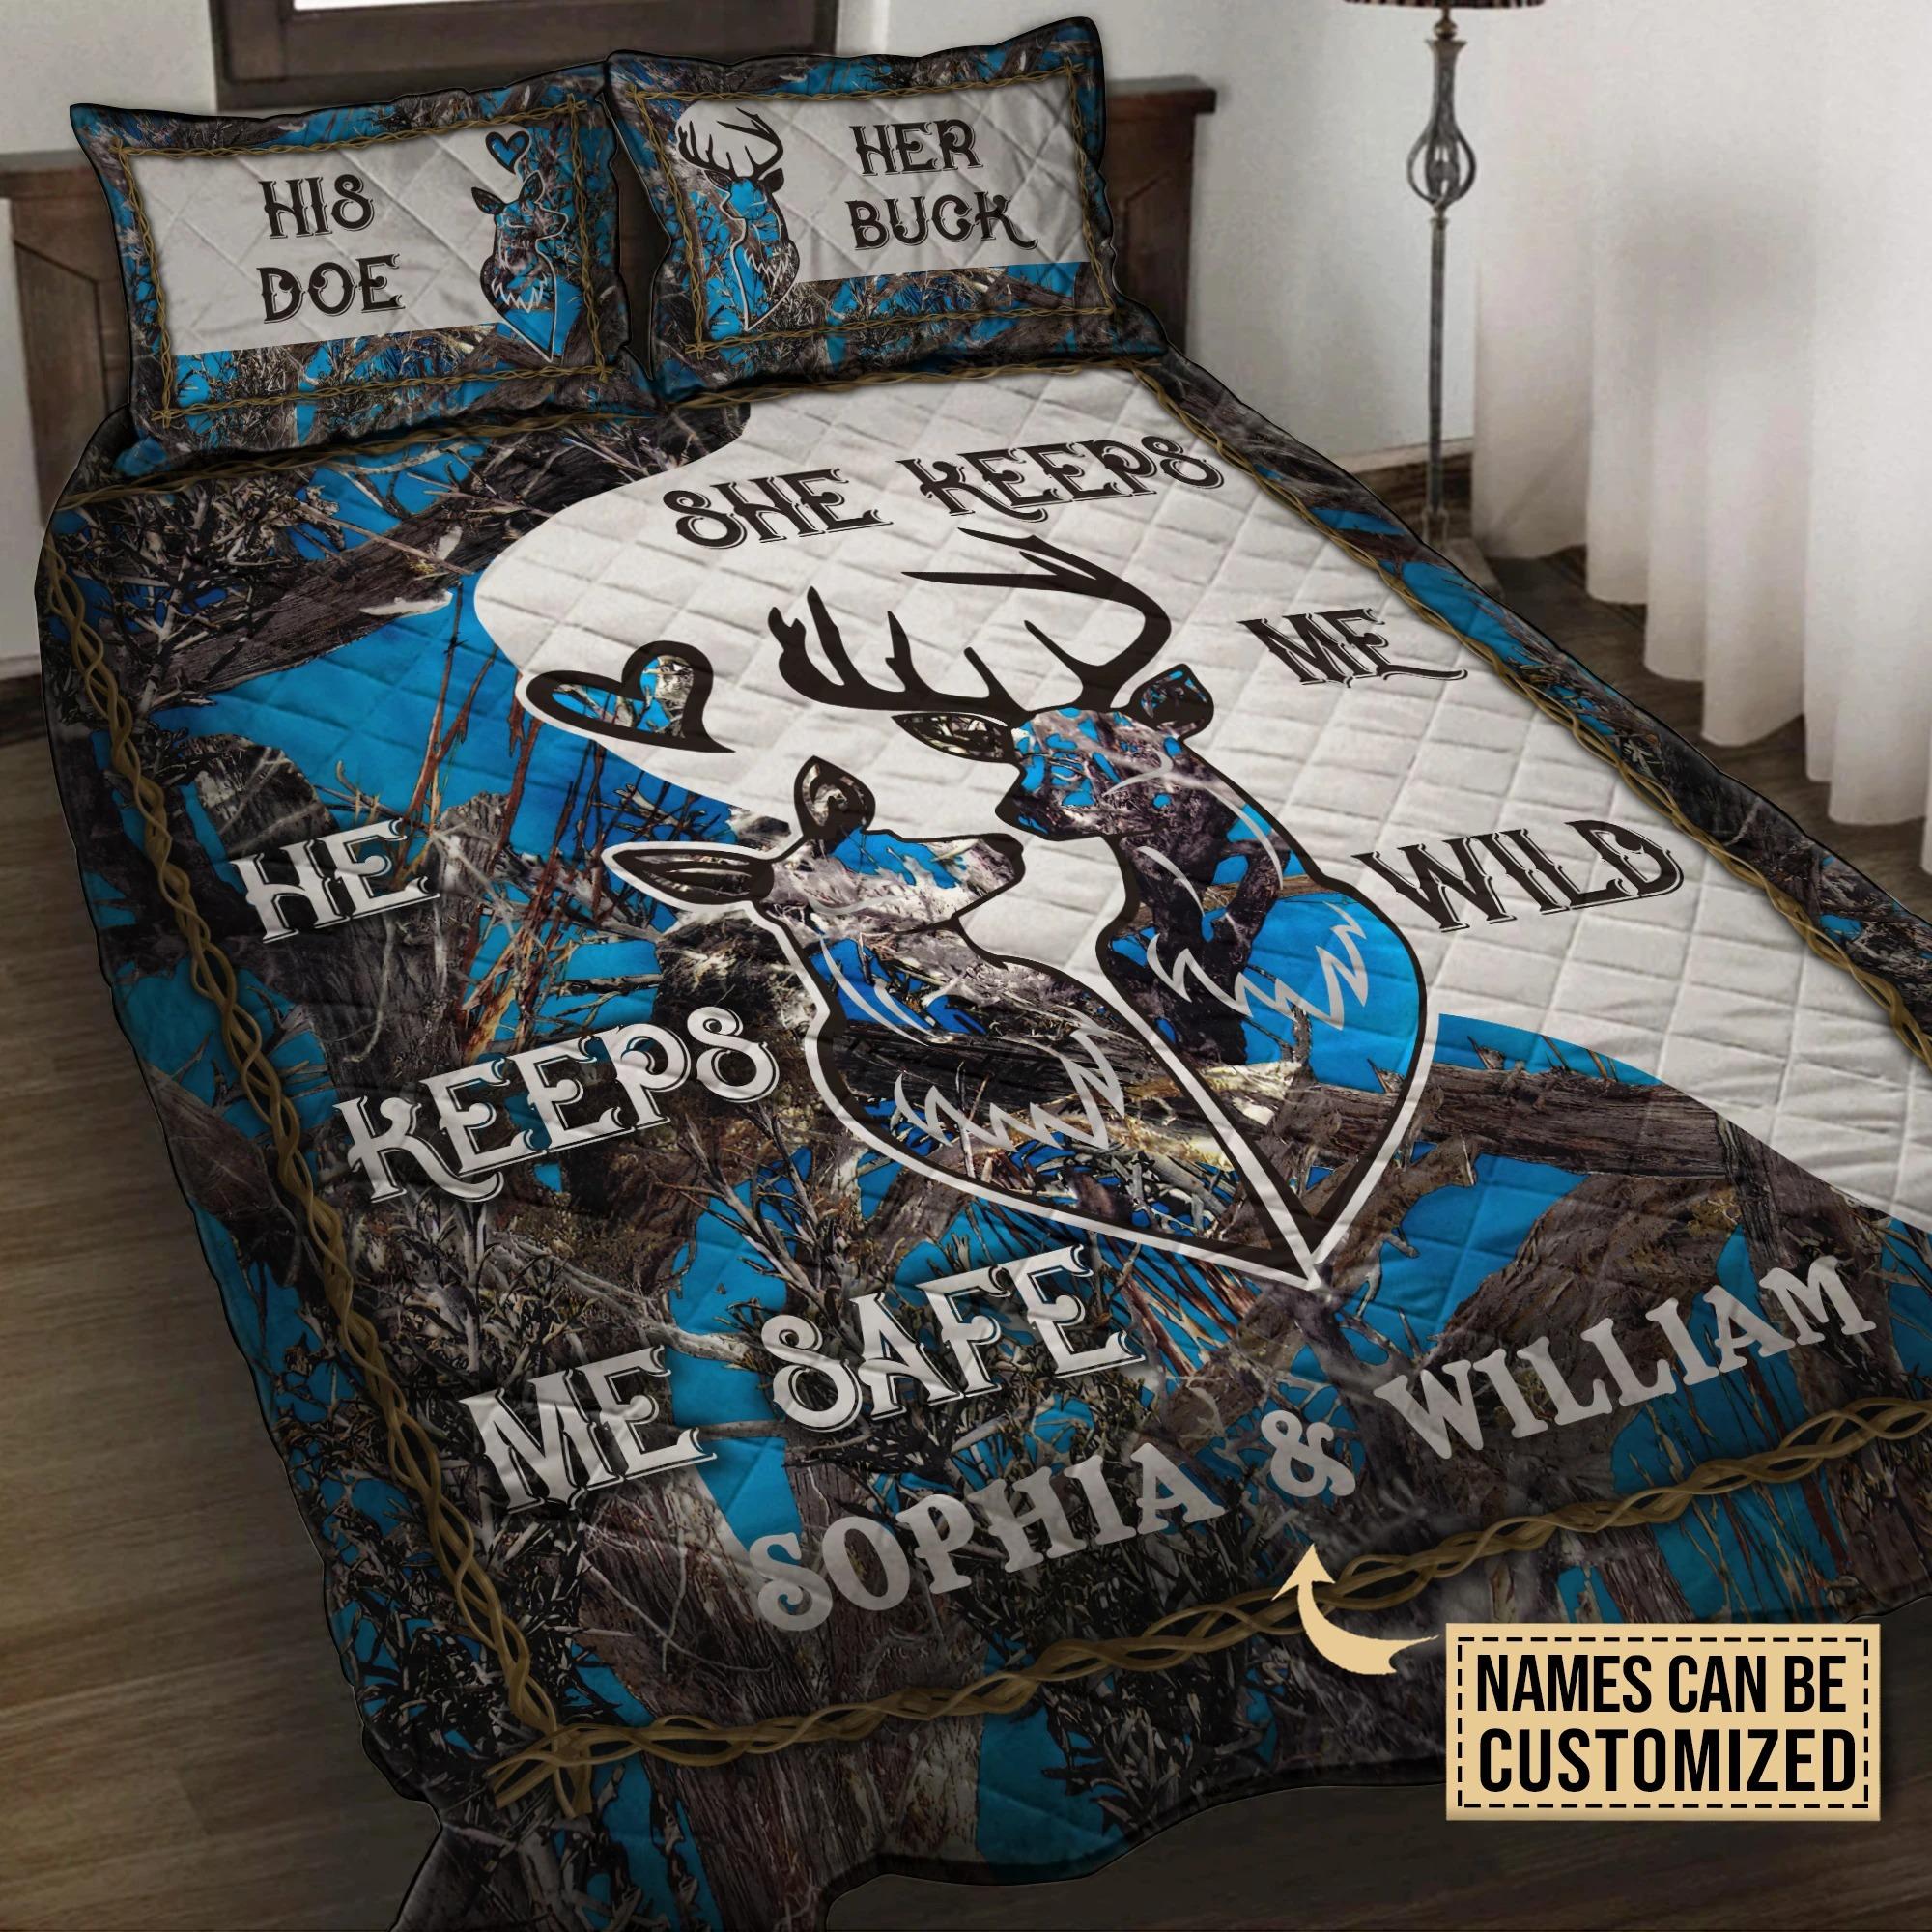 His doe her buck she keep me wild he keeps me safe custom name quilt bedding set3